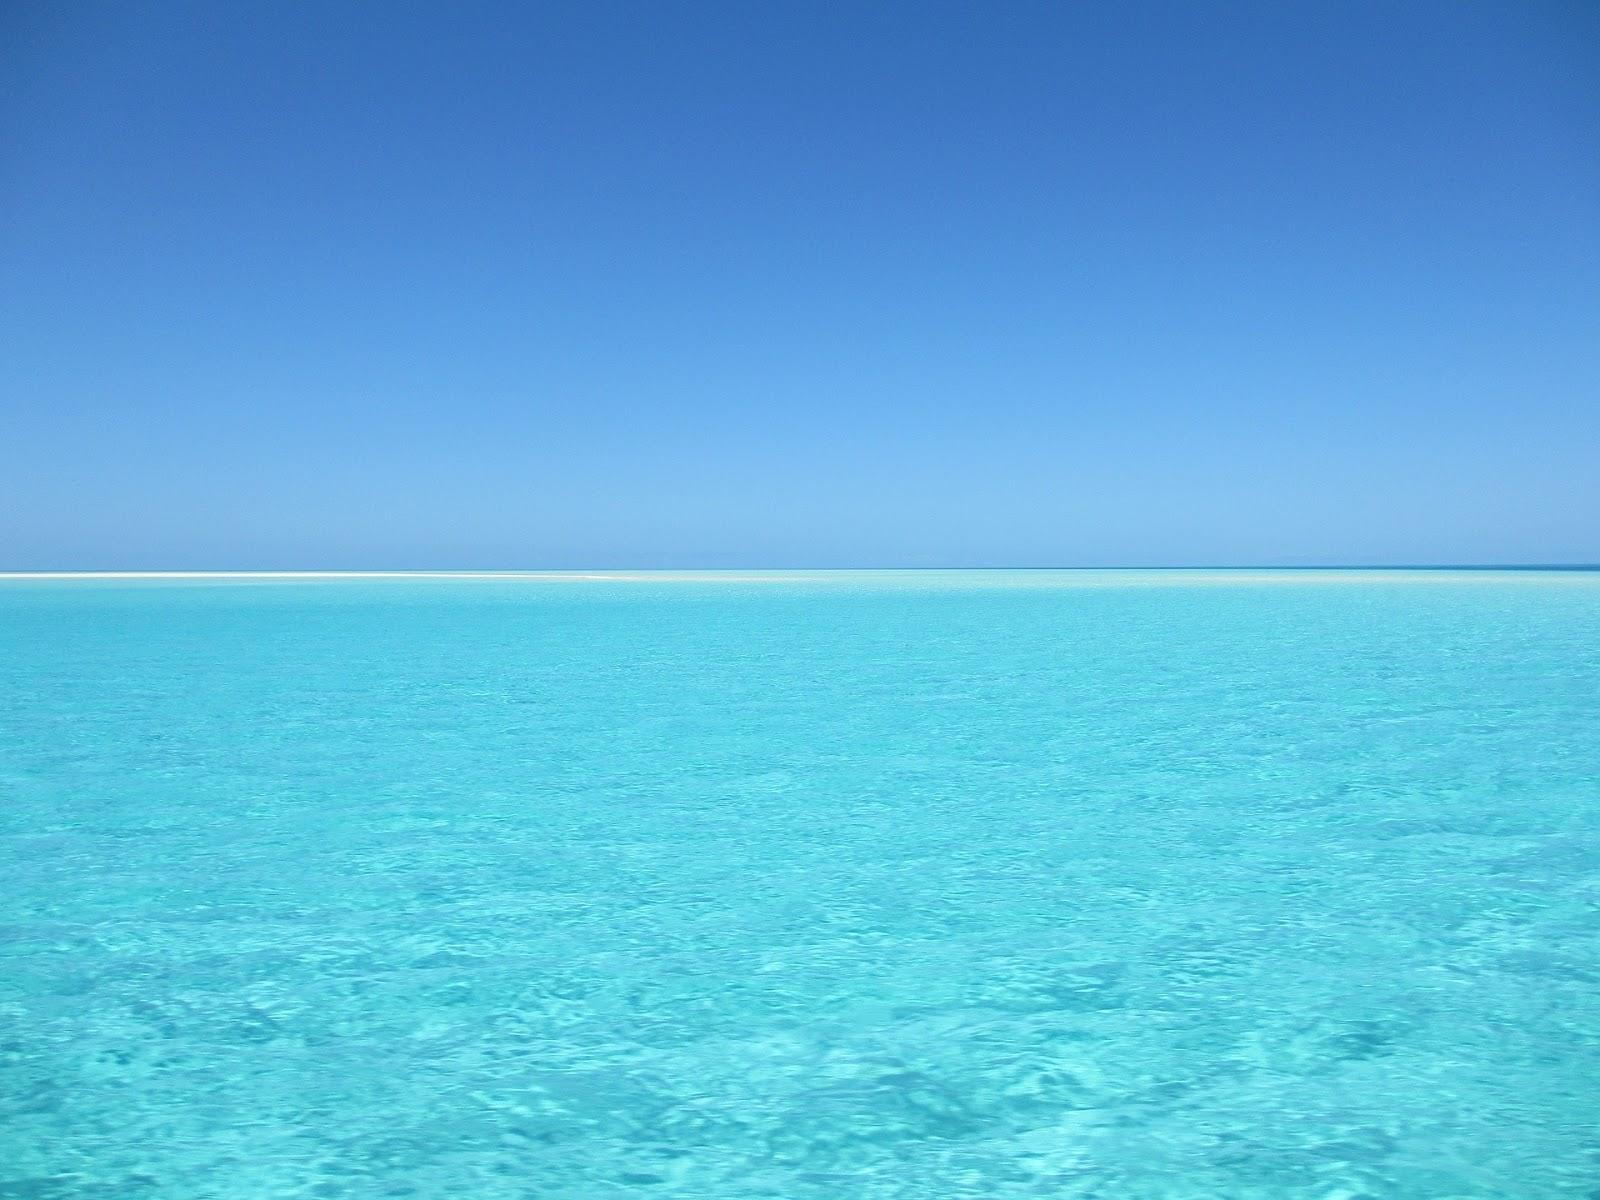 8 Gambar Pemandangan Laut Indah Hd Gambar Indah